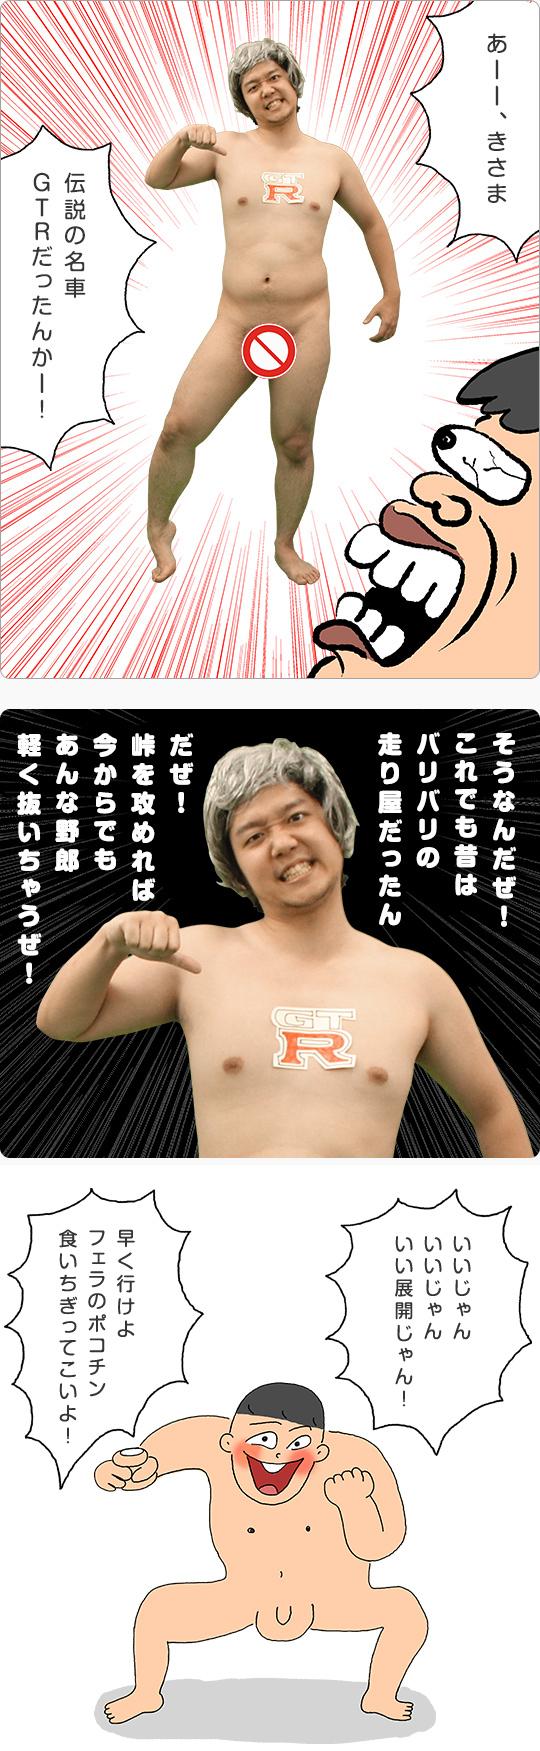 morioka_sensha_12_3.jpg